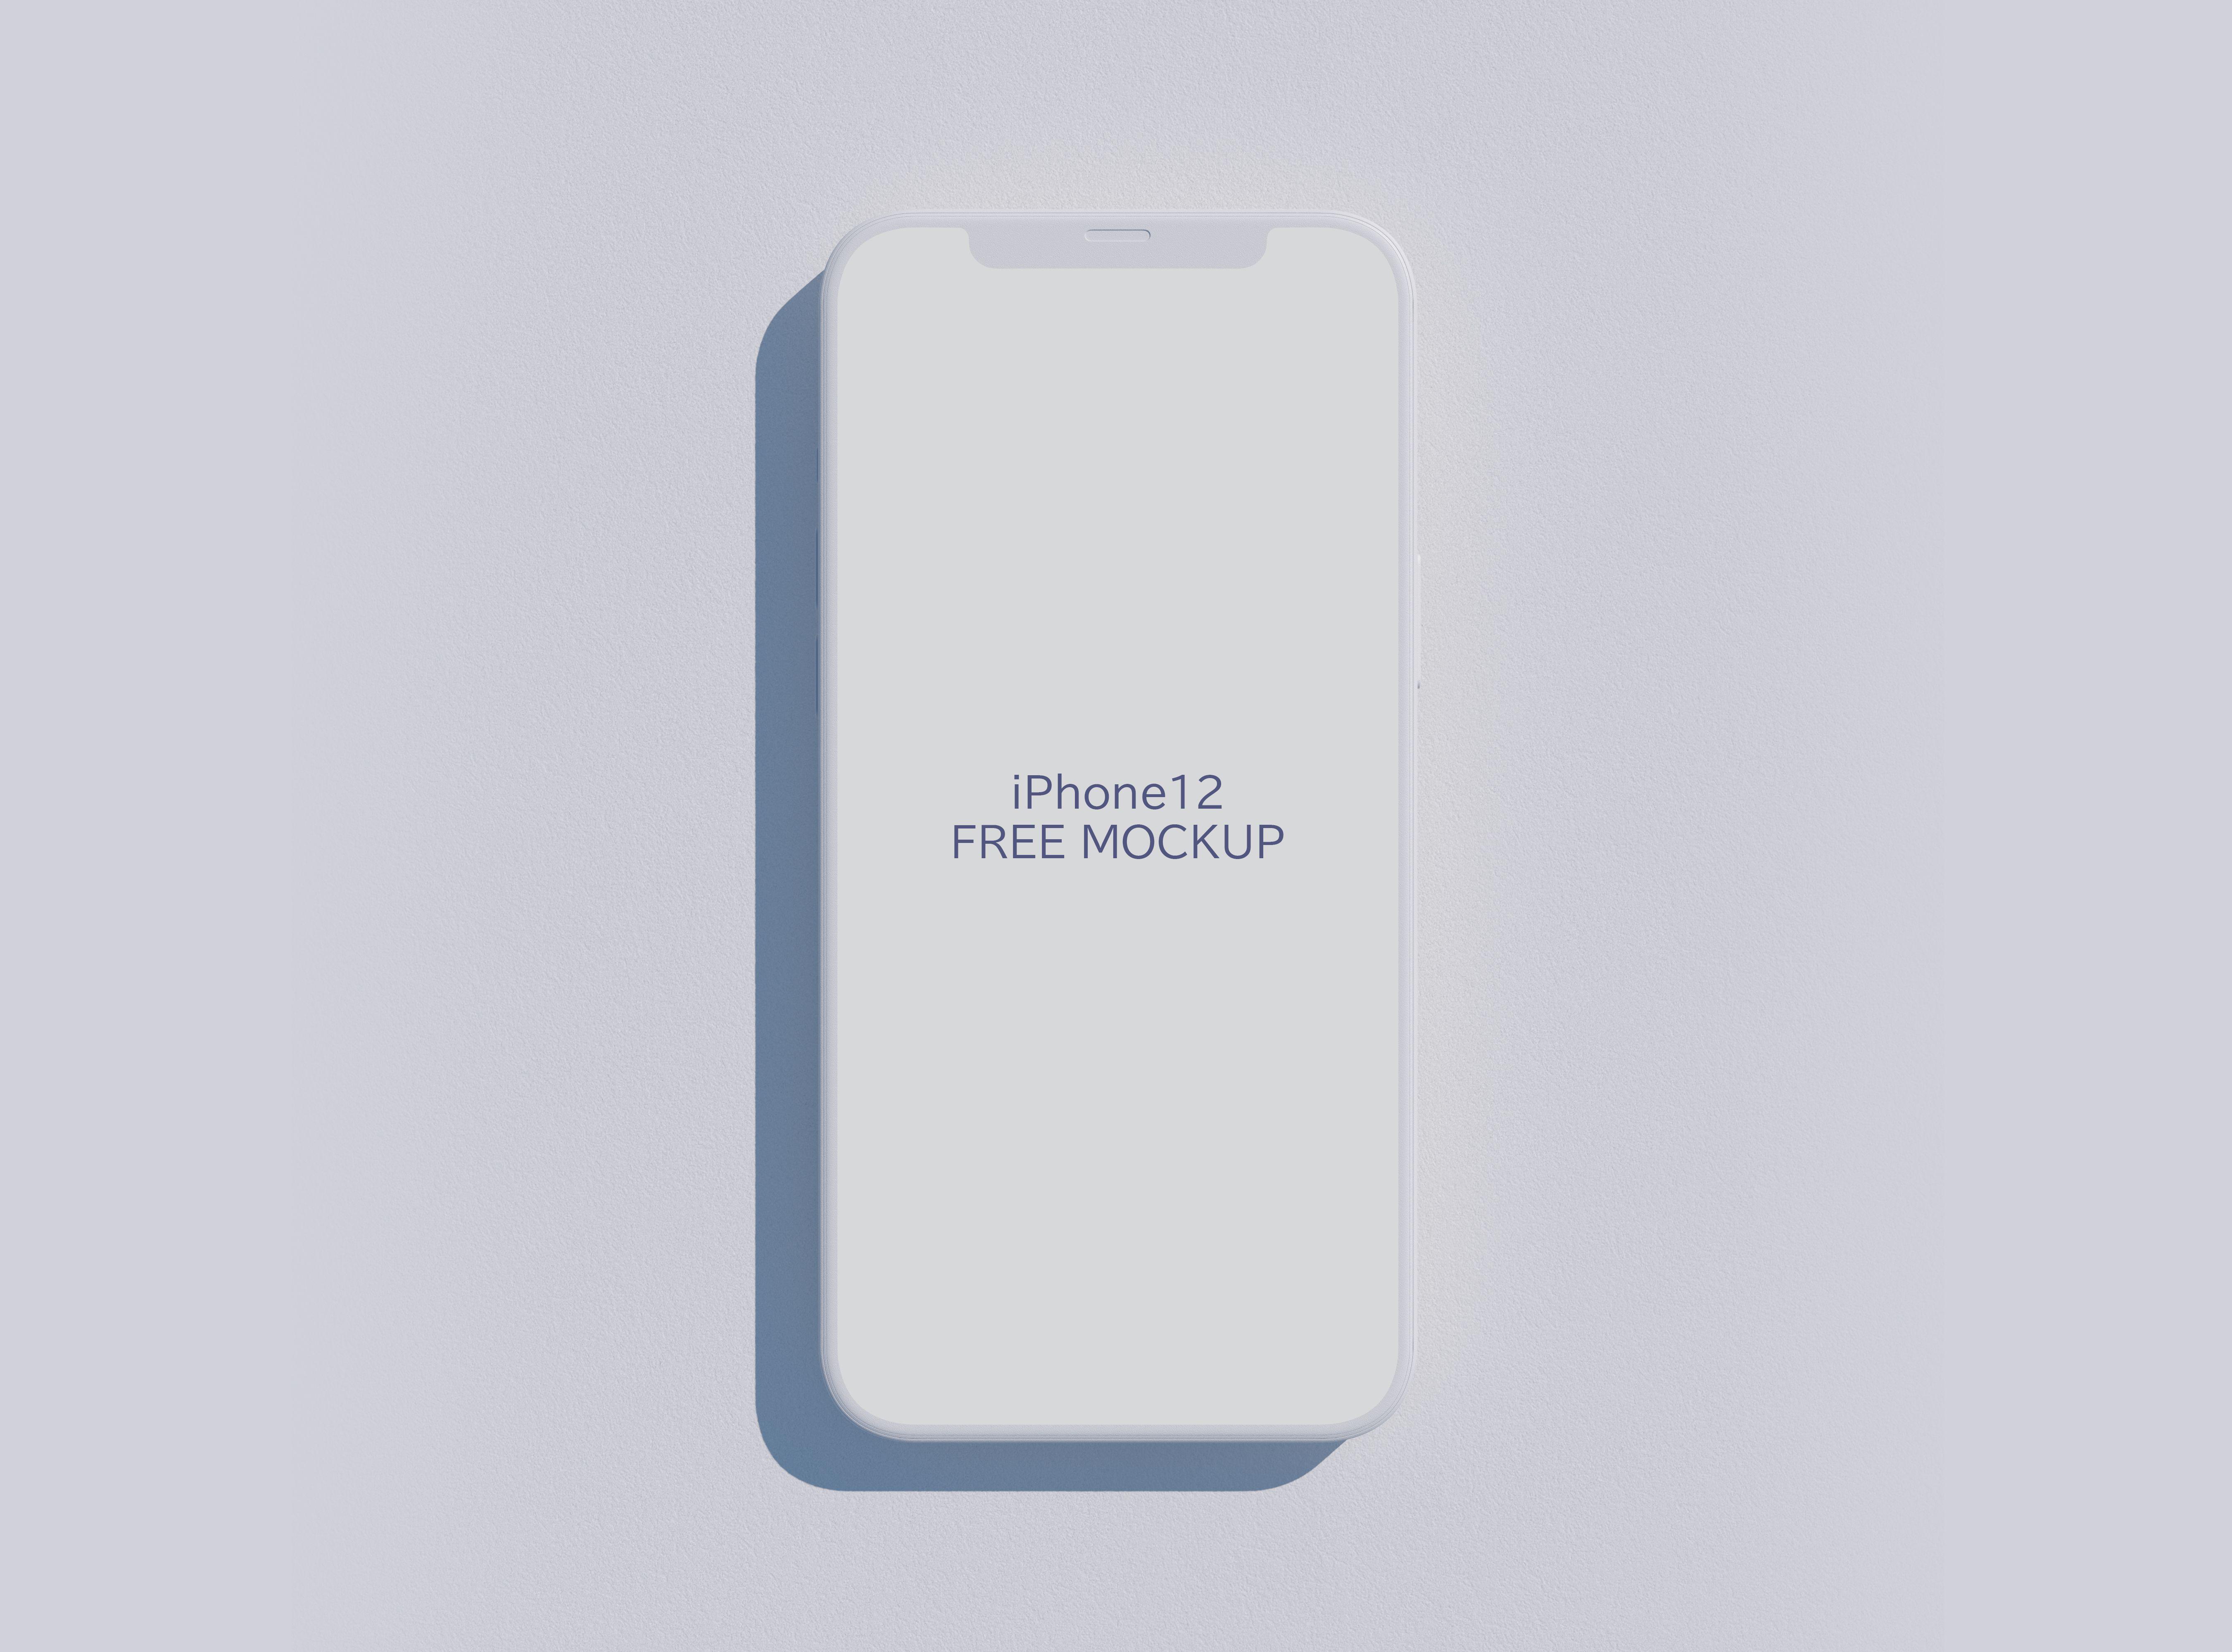 Download Free Iphone 12 Clay Mockup Psd Mockup Psd Free Mockup Free Iphone